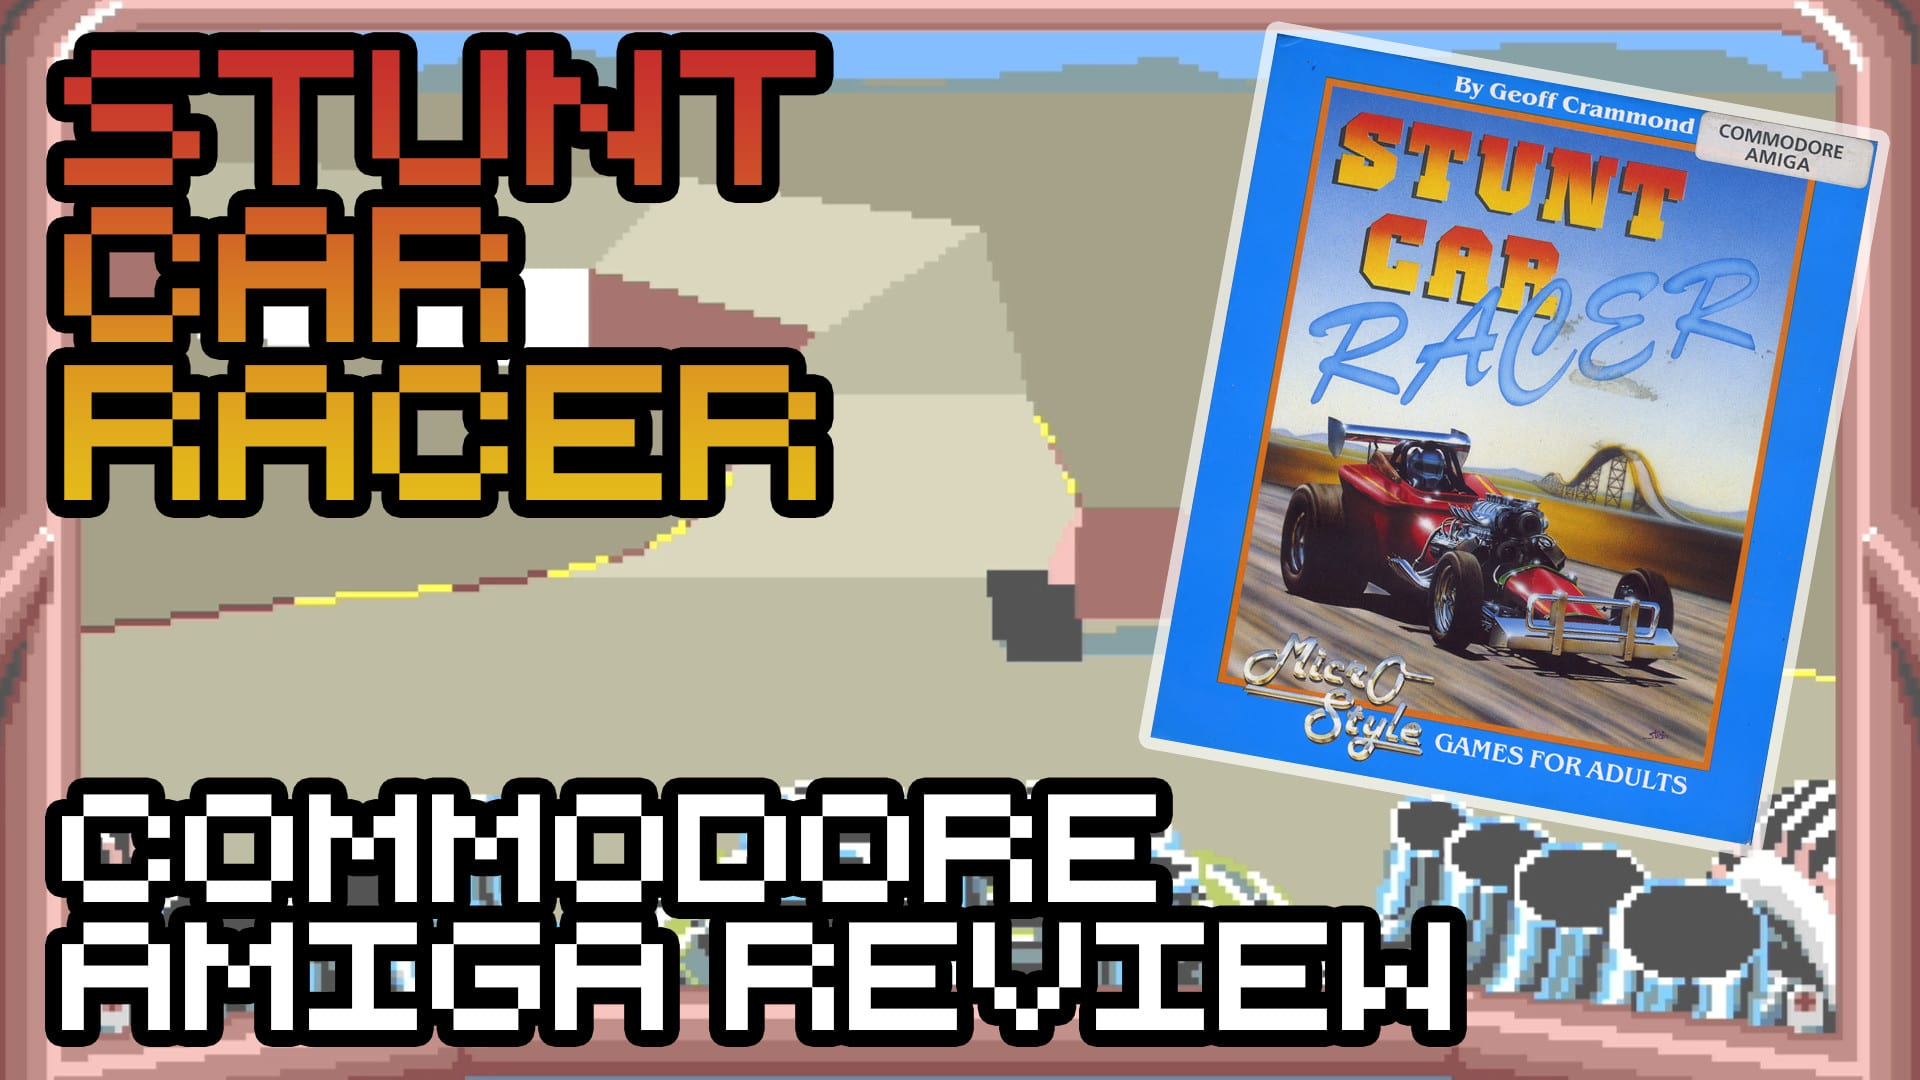 Stunt Car Racer – Commodore Amiga Review